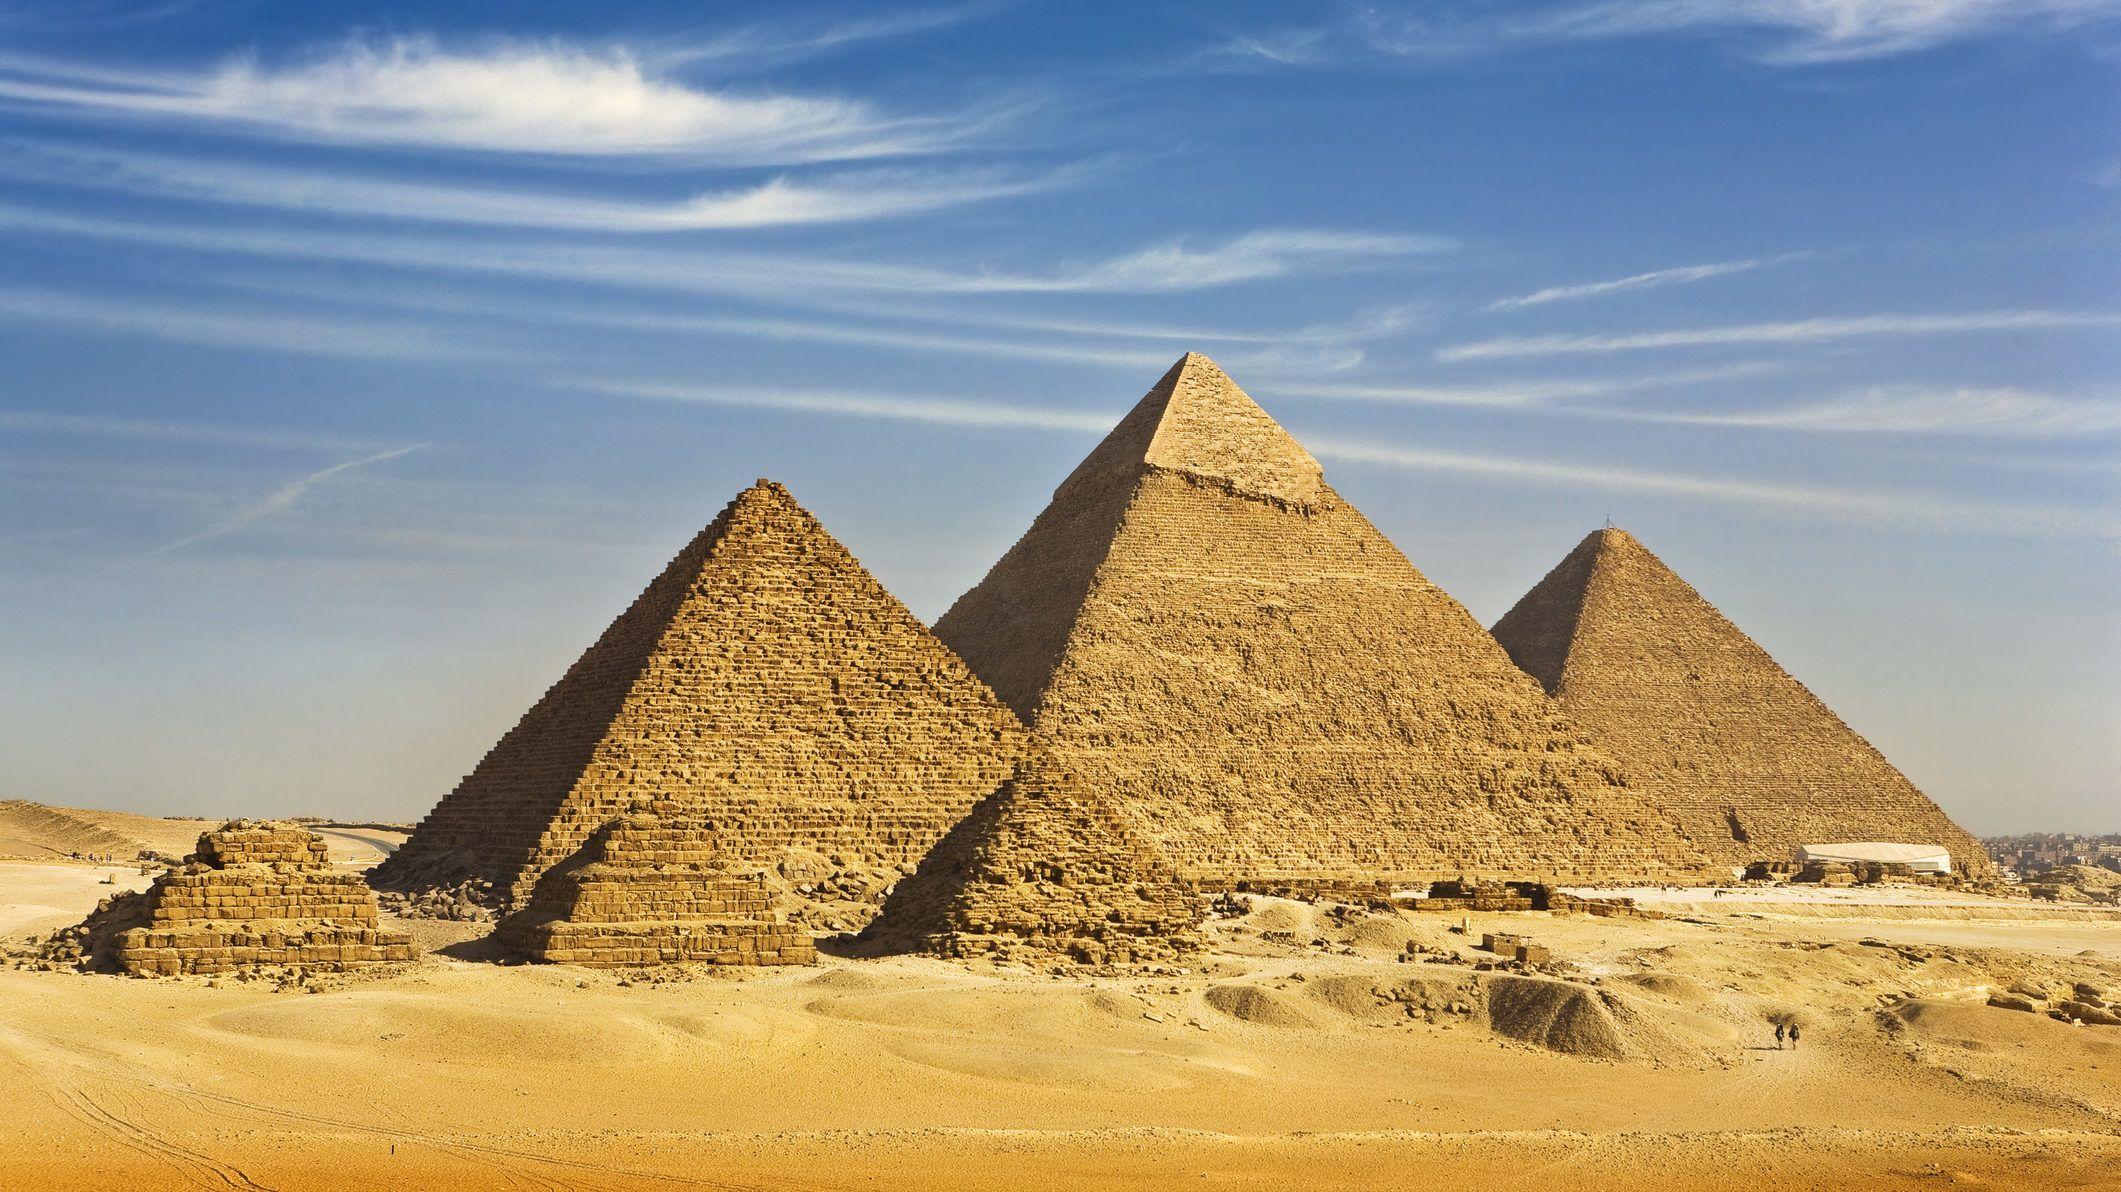 15_gizai_piramisok.jpg